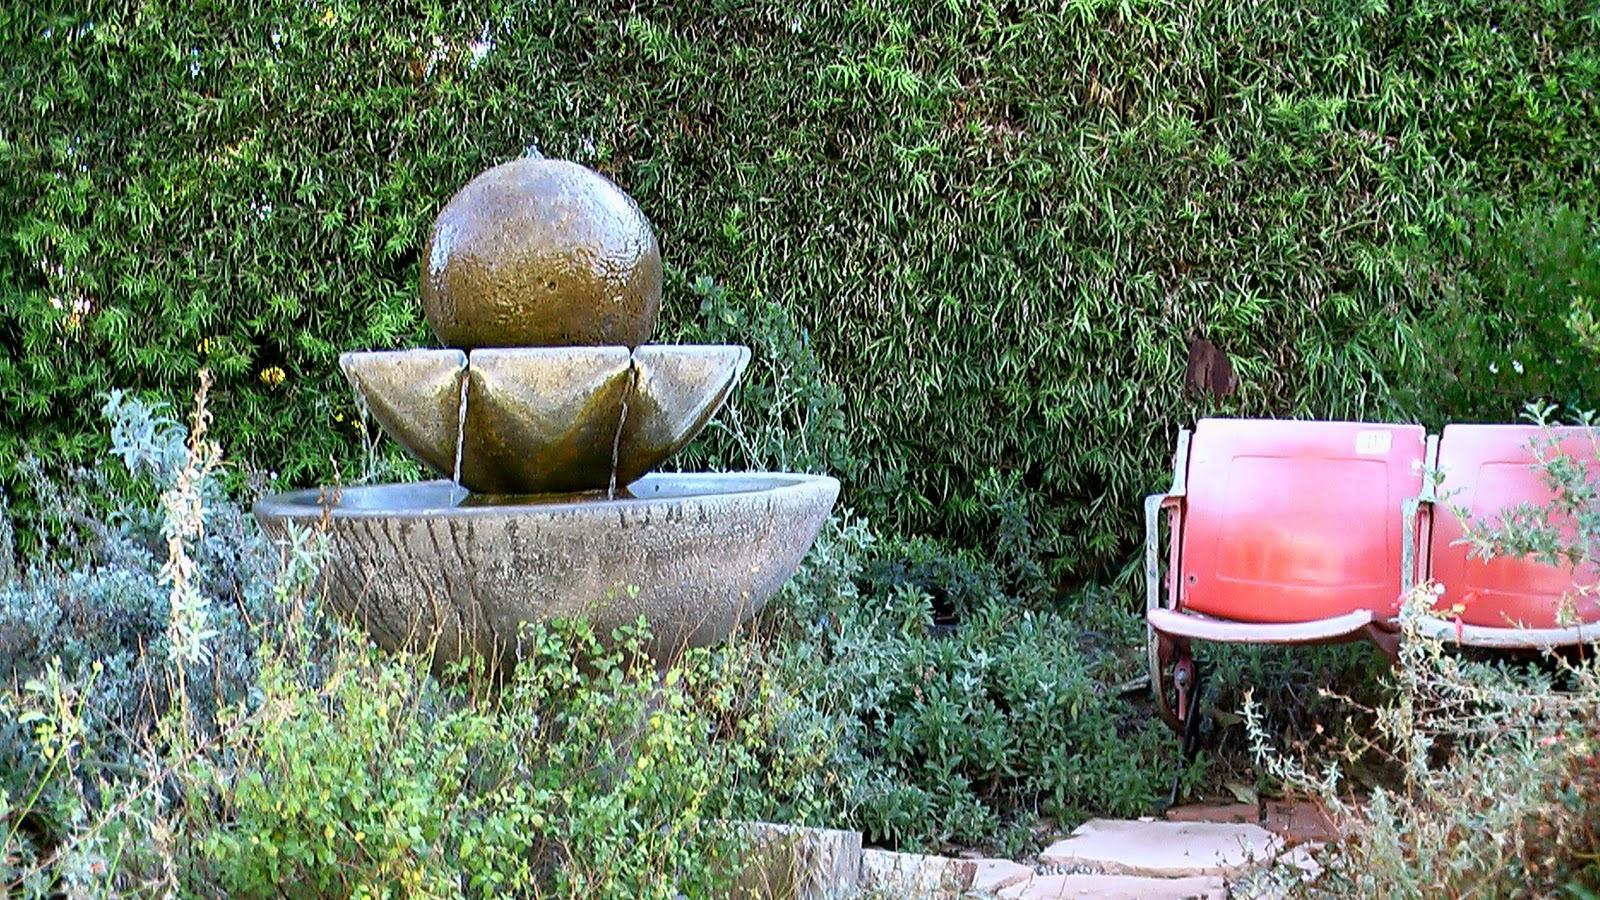 mar vista green garden showcase 13014 morningside way cluster 4c